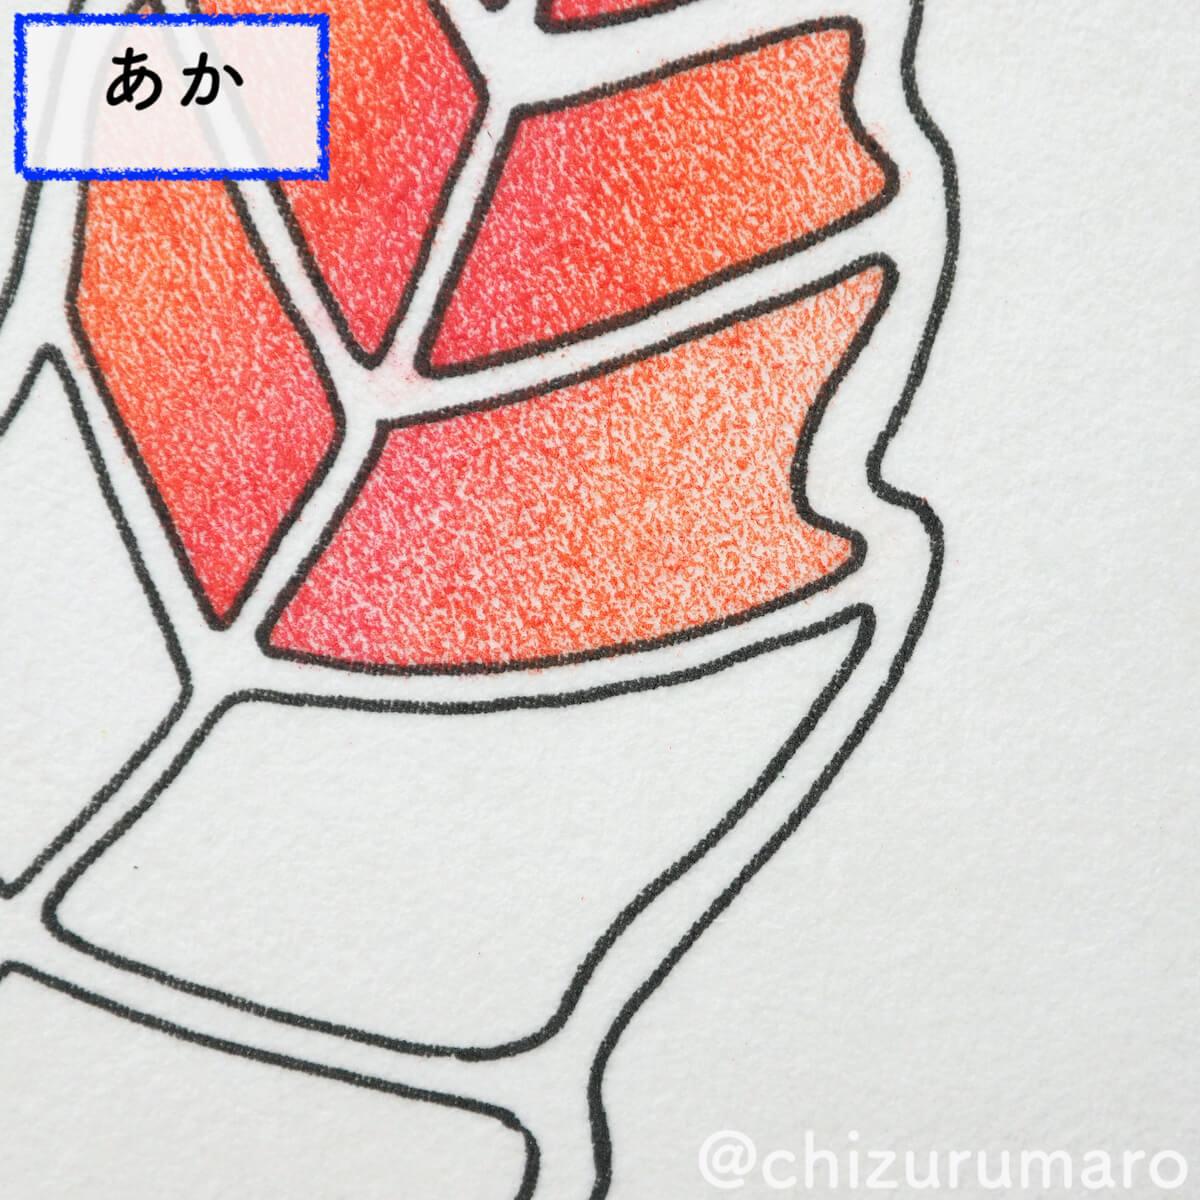 f:id:chizurumaro:20200603122213j:plain